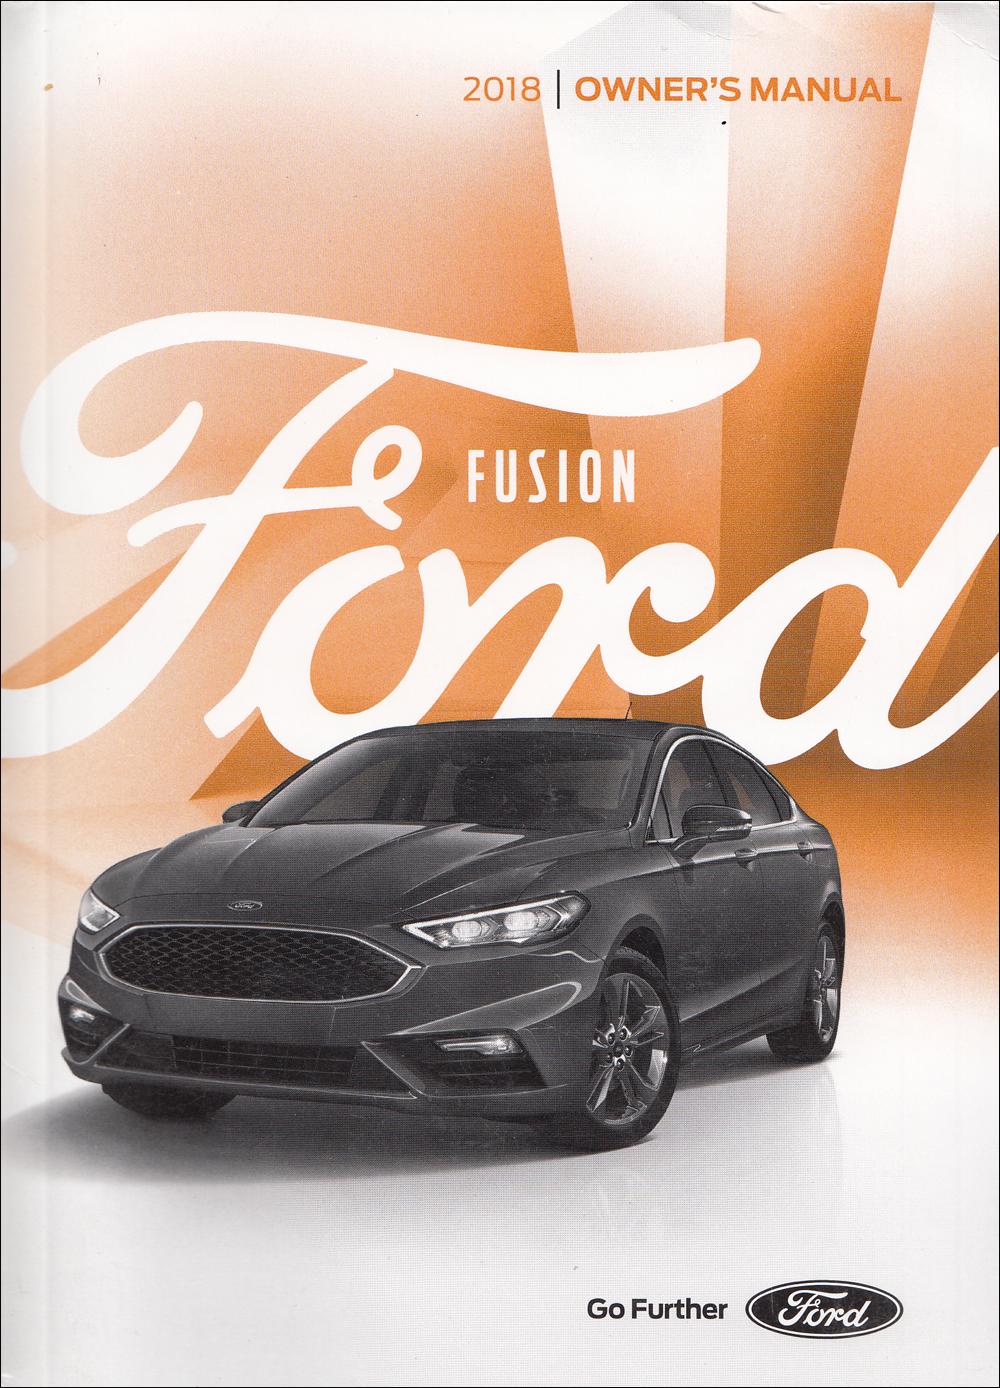 2018 Ford Fusion Owner's Manual Original